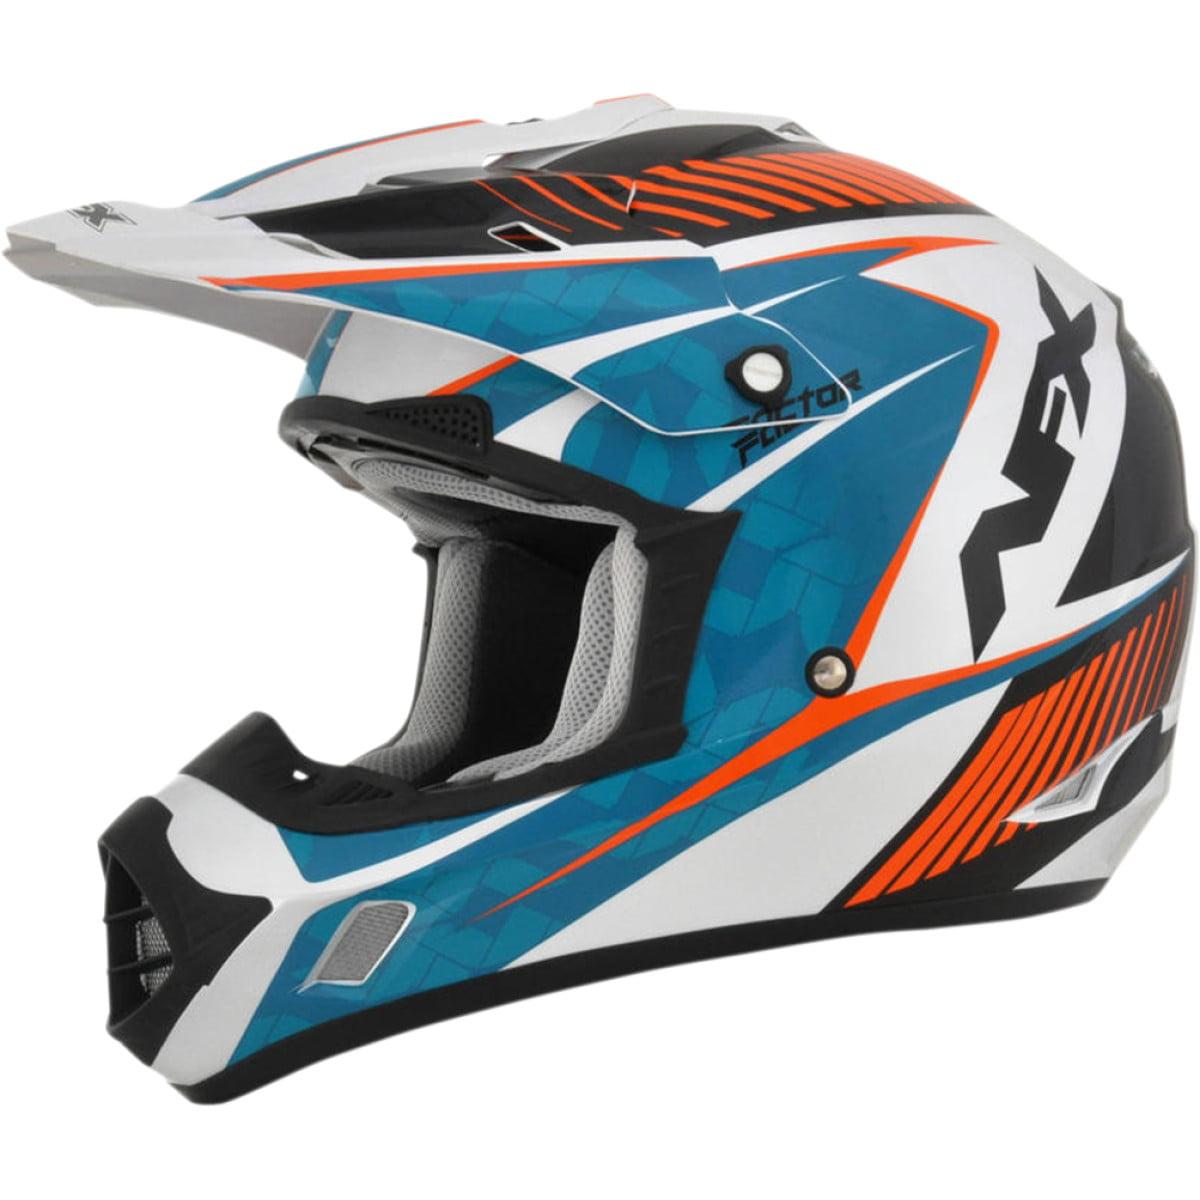 AFX FX-17 Offroad Helmet (Factor Blue/Orange/White Clear Coat, 2X-Large)